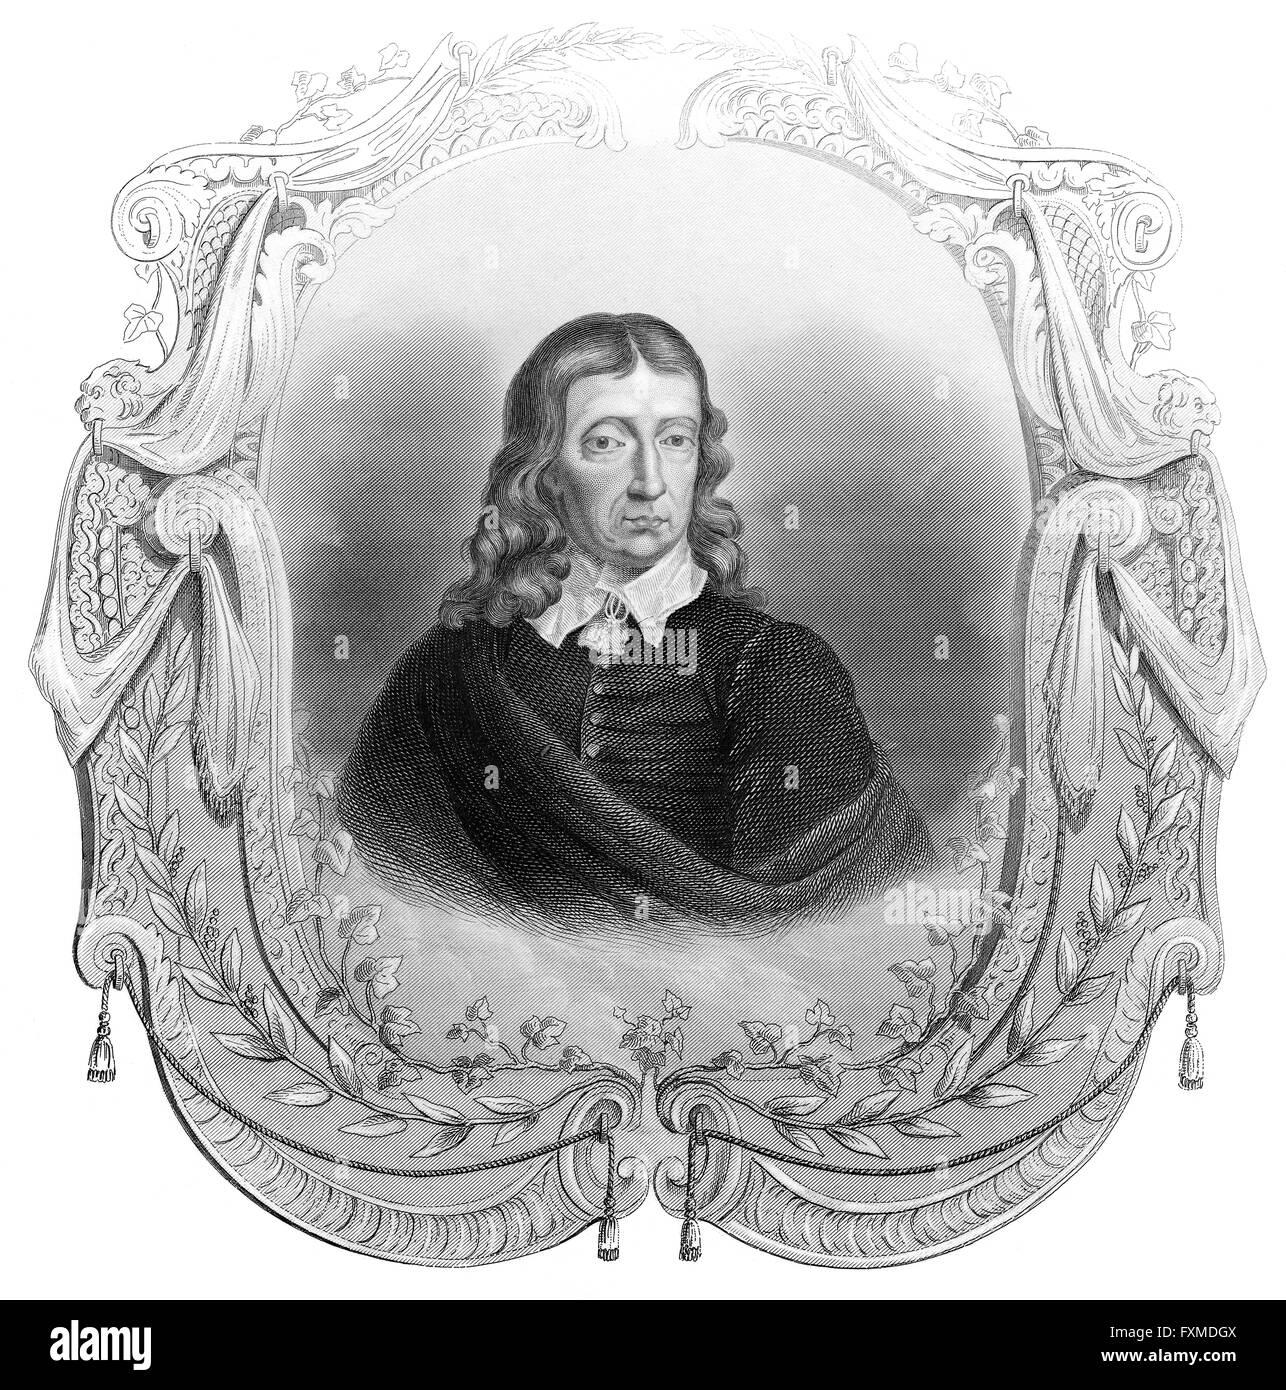 John Milton, 1608 - 1674, an English poet and political philosopher, John Milton, 1608 - 1674, ein englischer Dichter - Stock Image